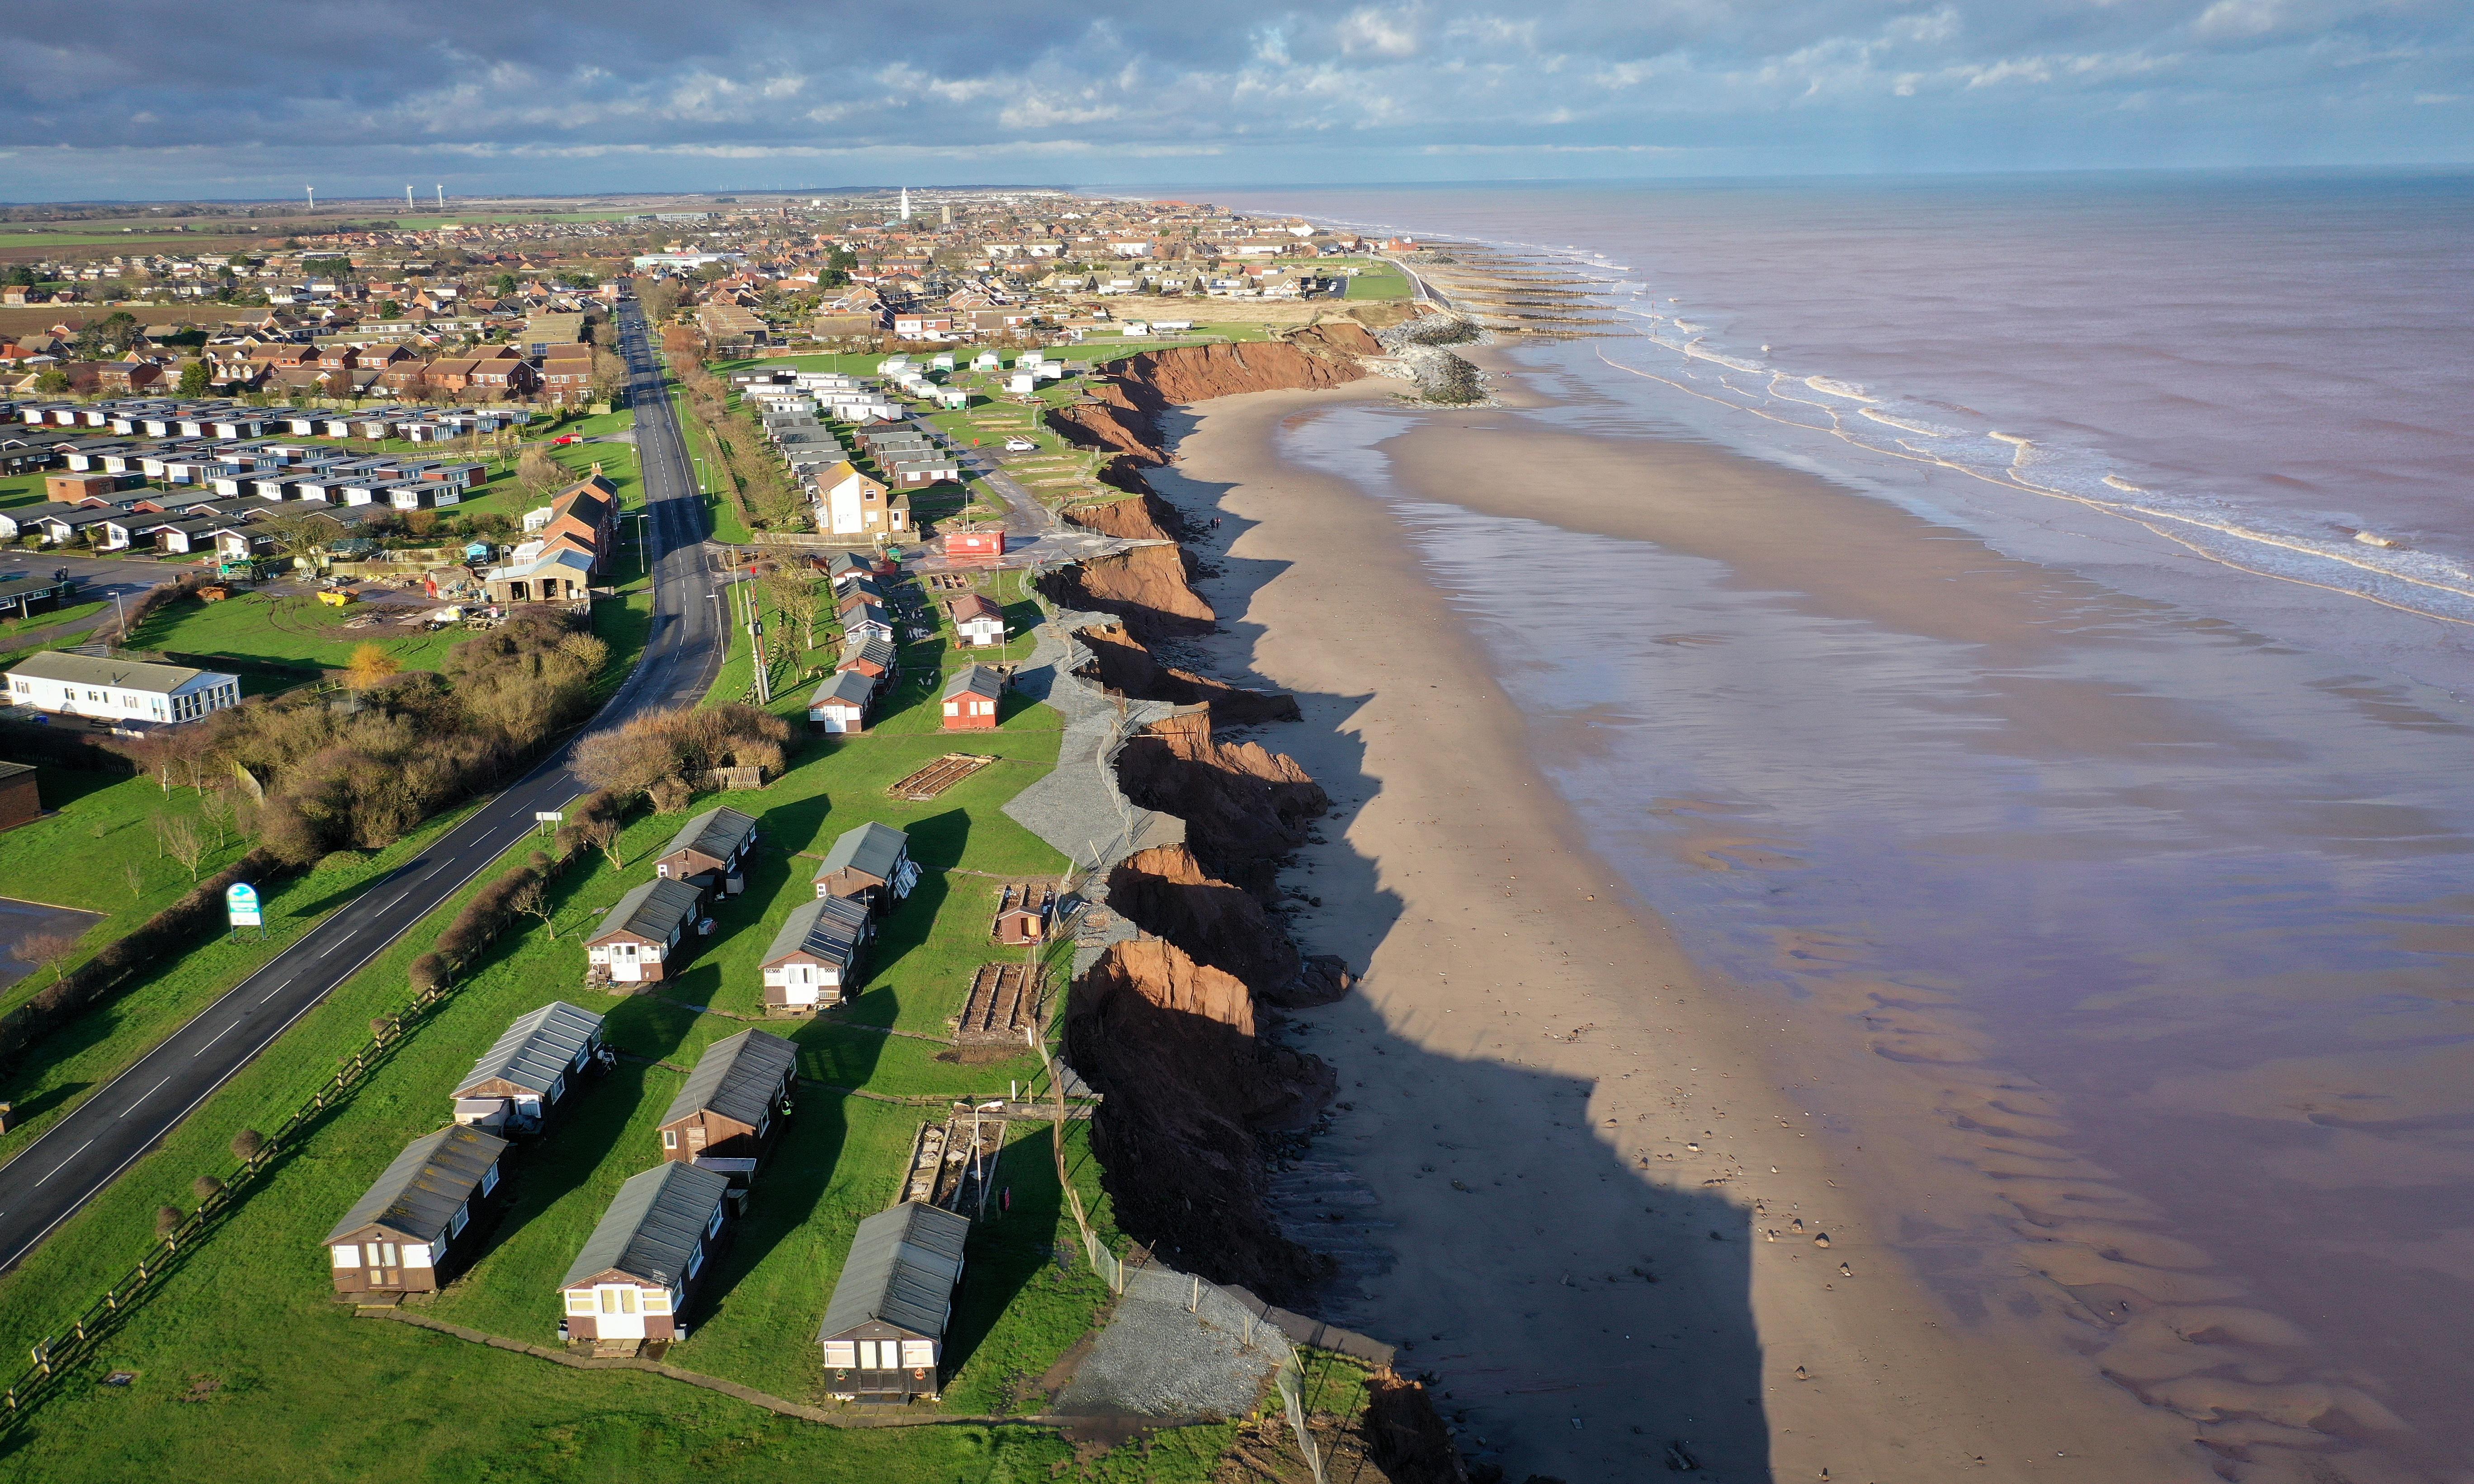 Treat coastal erosion as a natural catastrophe, UK ministers urged